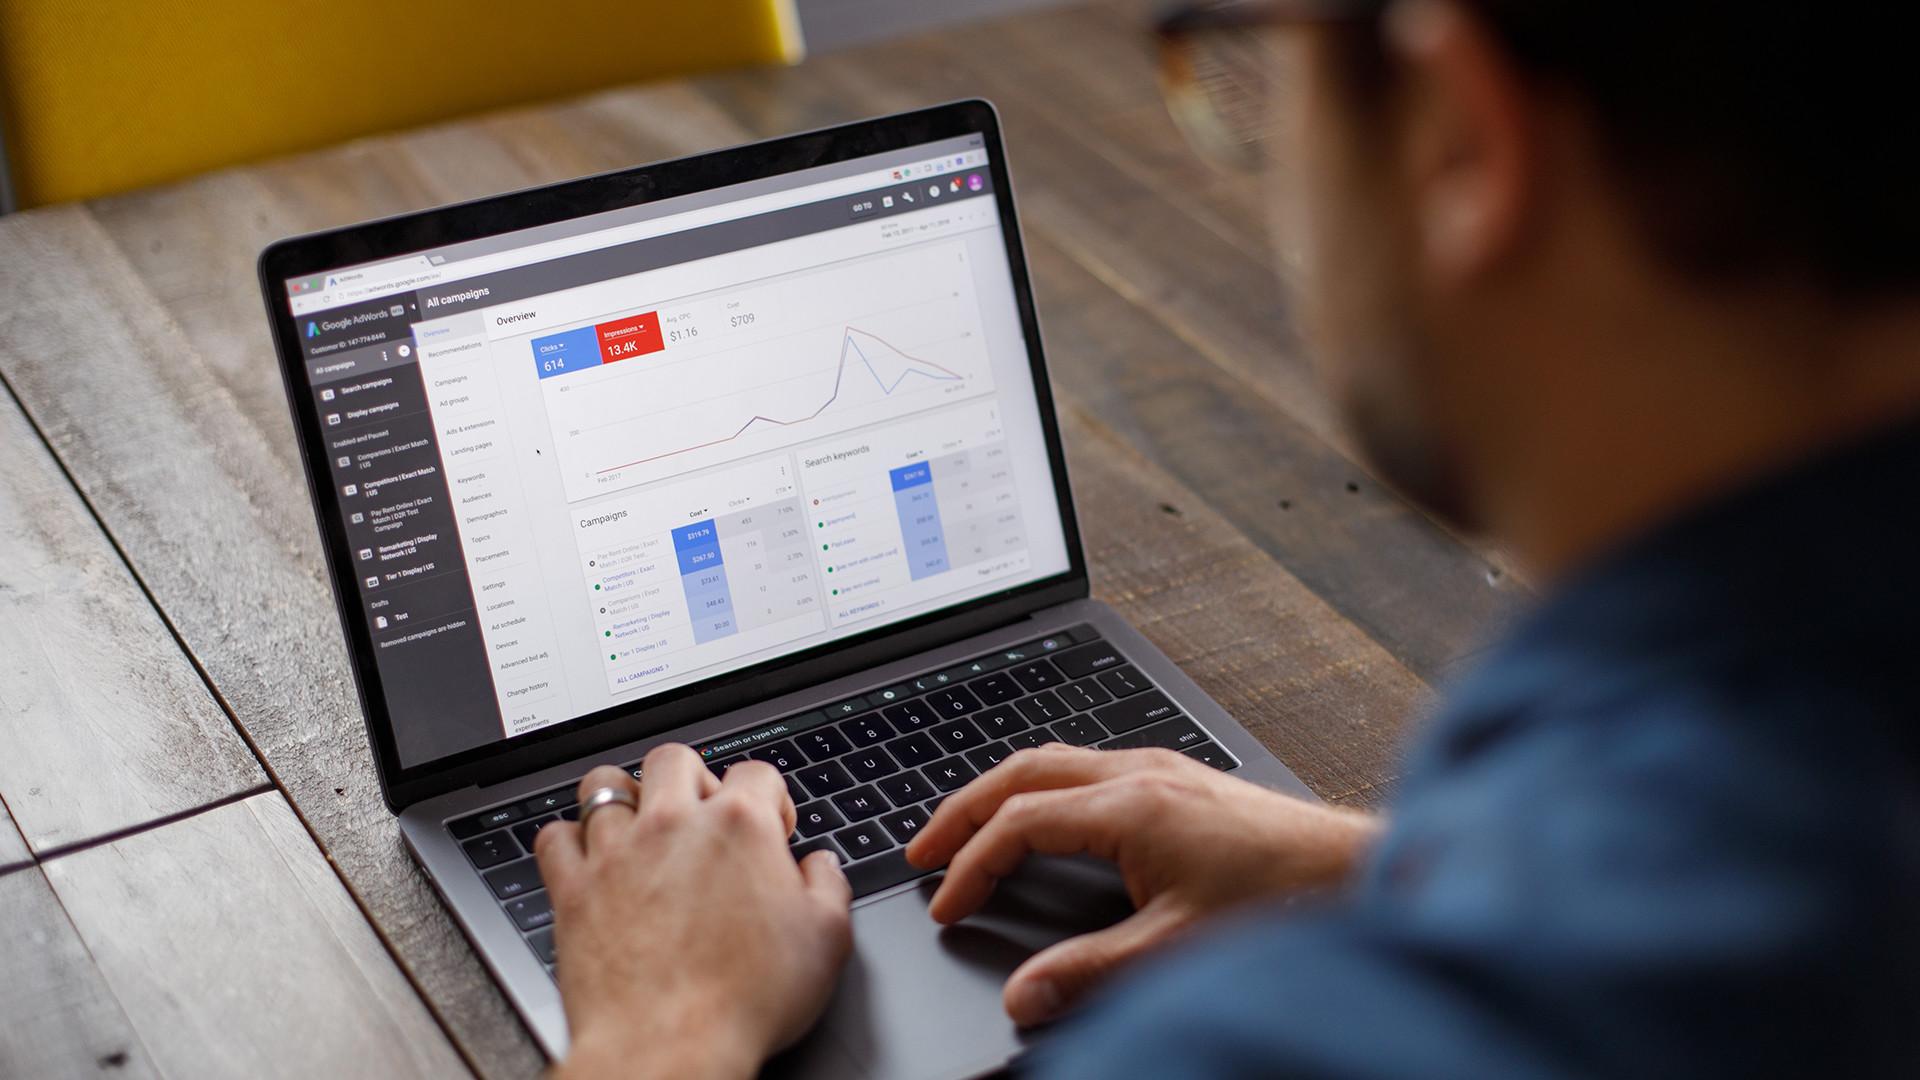 Google Ads overzichtscherm op een laptop